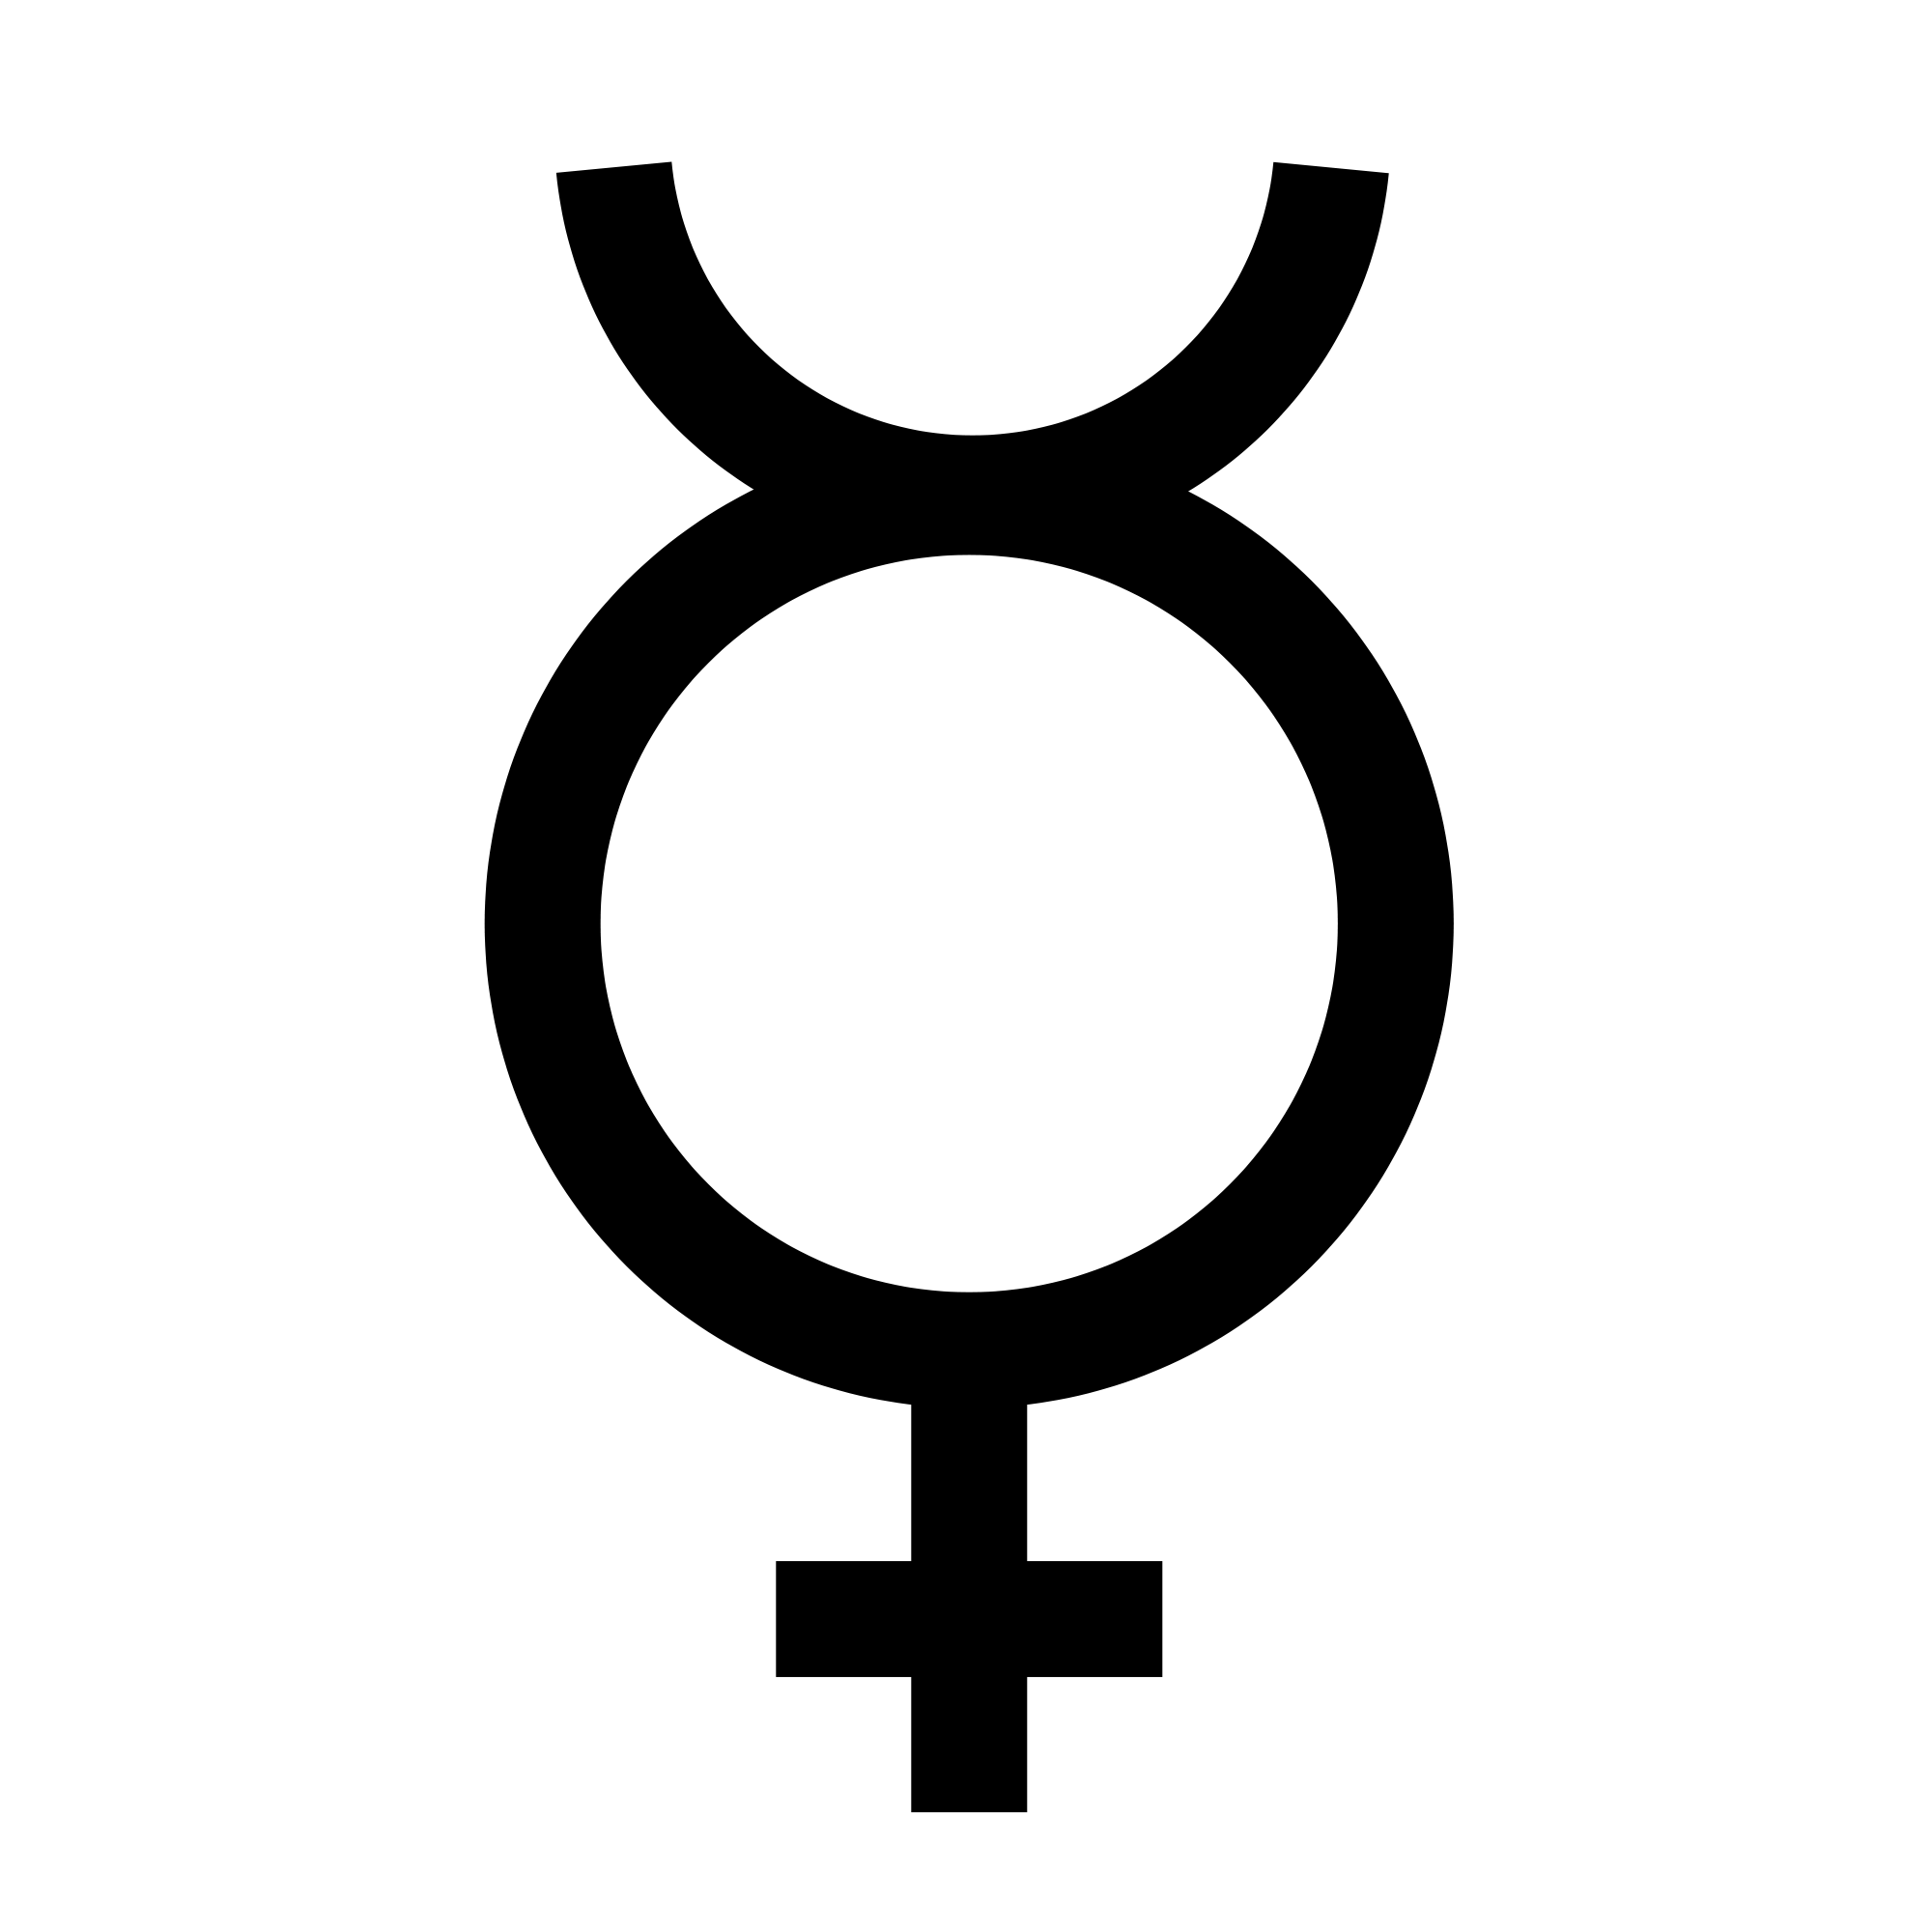 Sun moon earth pluto mars venus astrology clipart graphic black and white SkyCode Horoscopes for April 23-April 29, 2018 - Unlockastrology.com graphic black and white